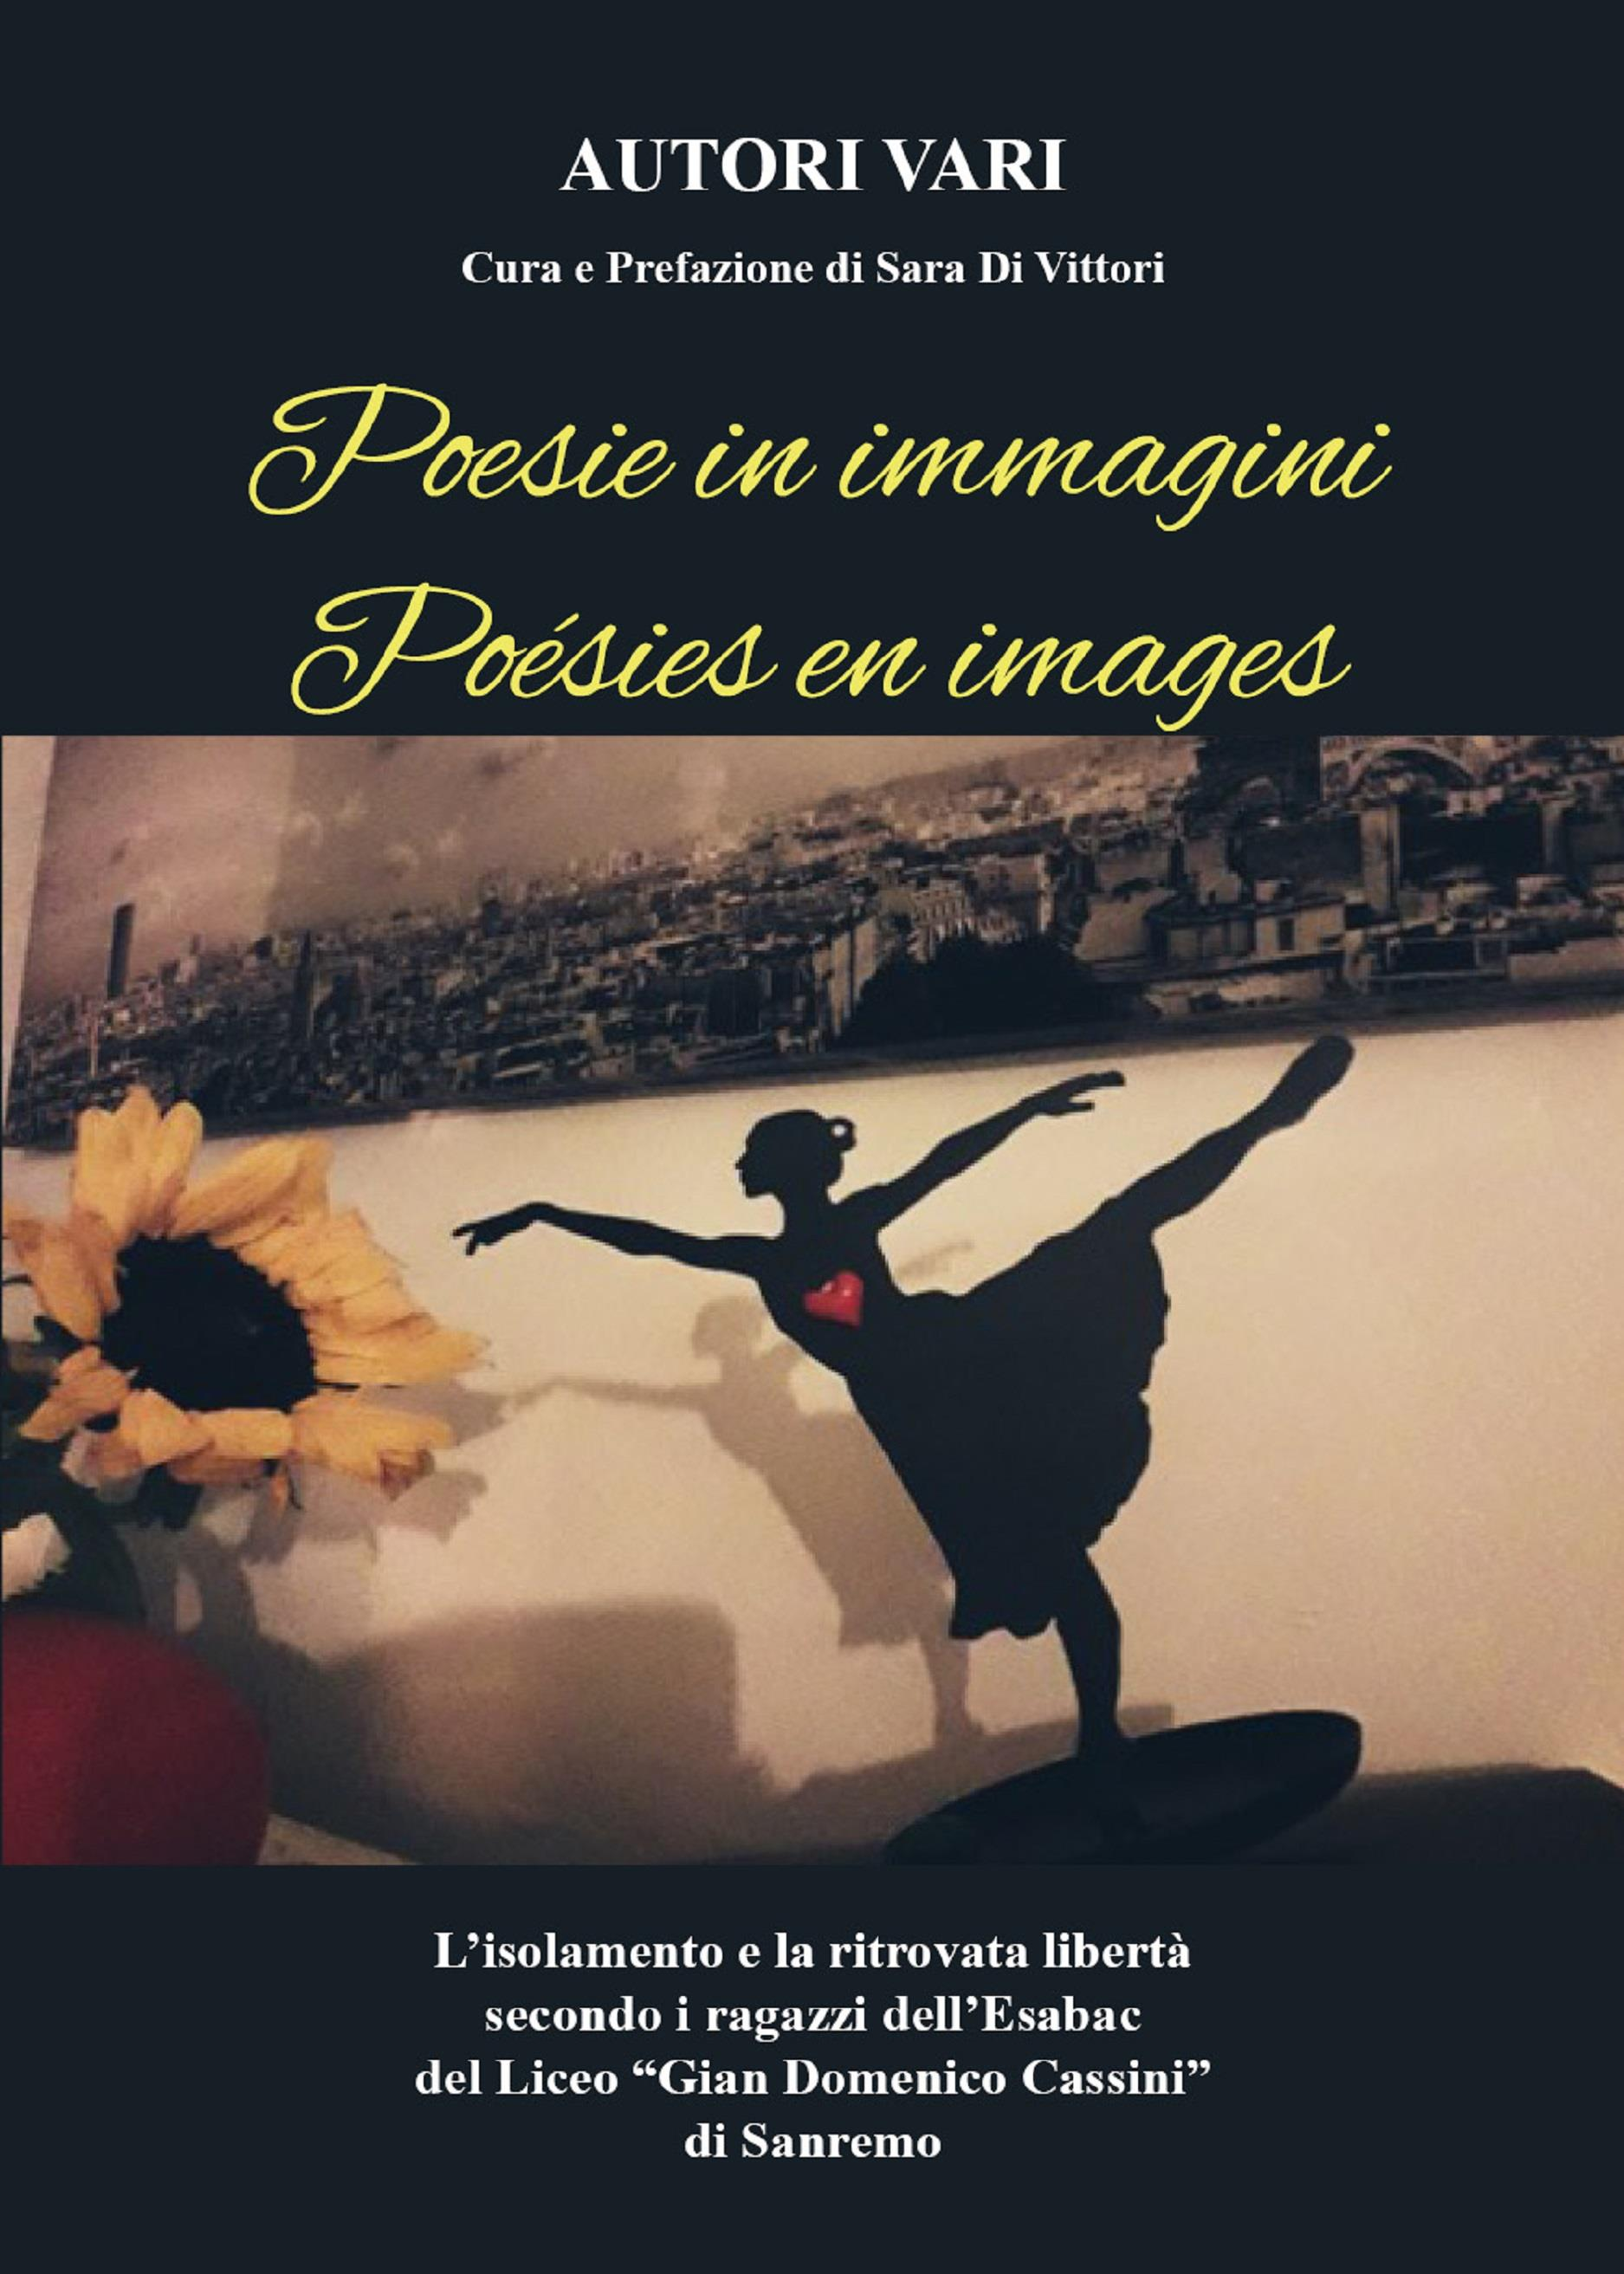 Poesie in immagini - Poésies en images a cura di Sara Di Vittori